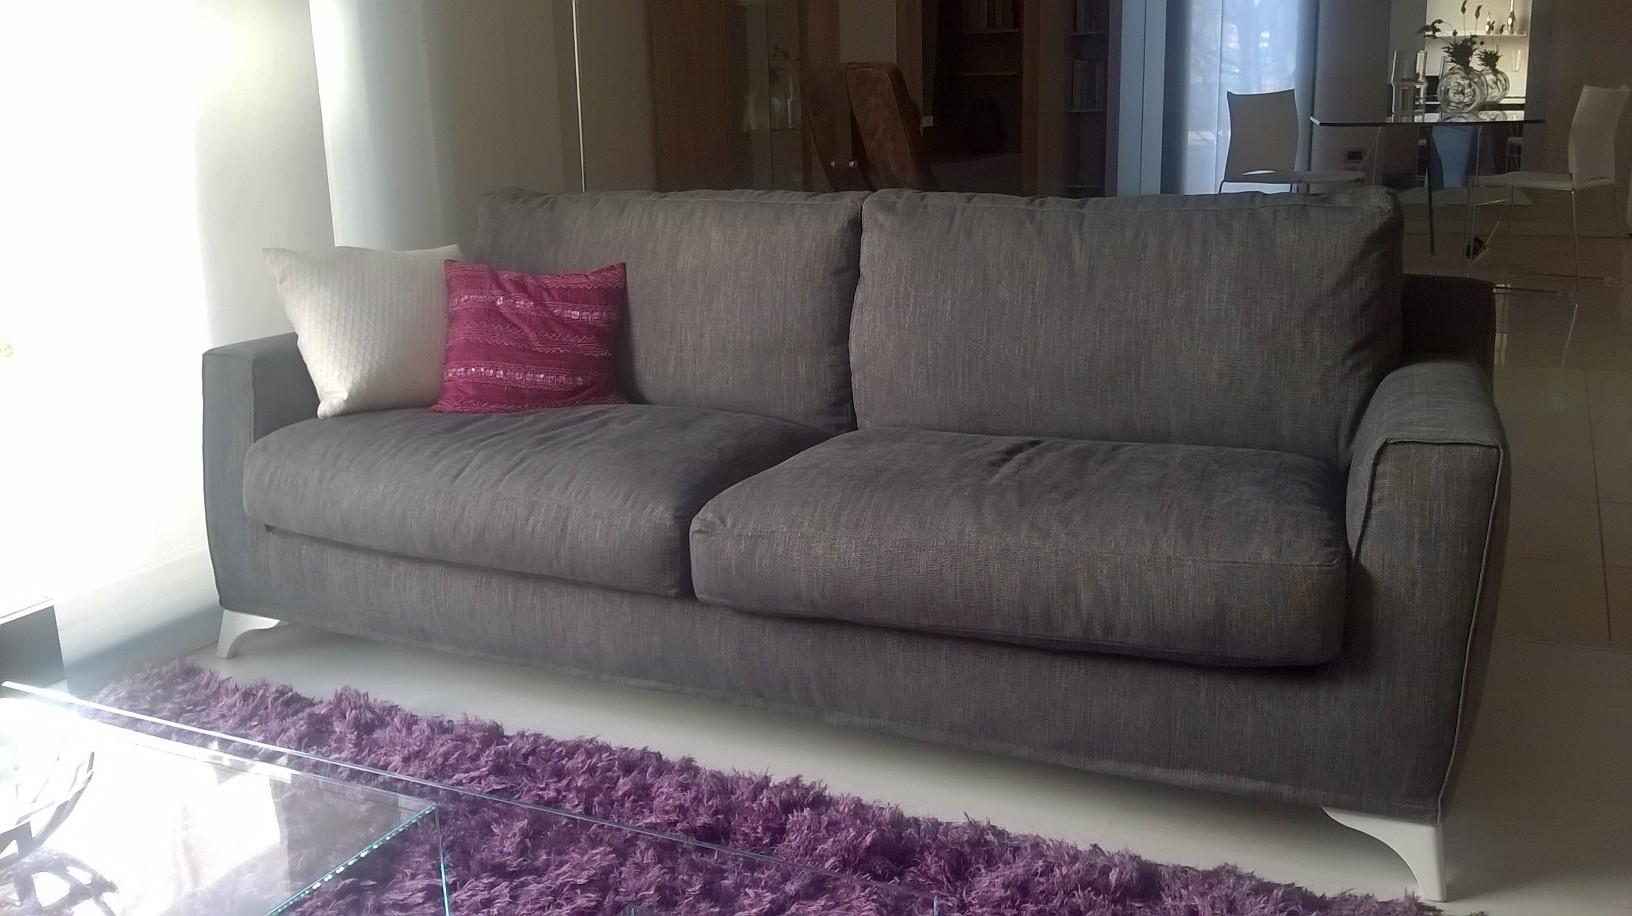 Divano bodema mr floyd divani lineari tessuto divano 3 - Divano profondita 70 ...